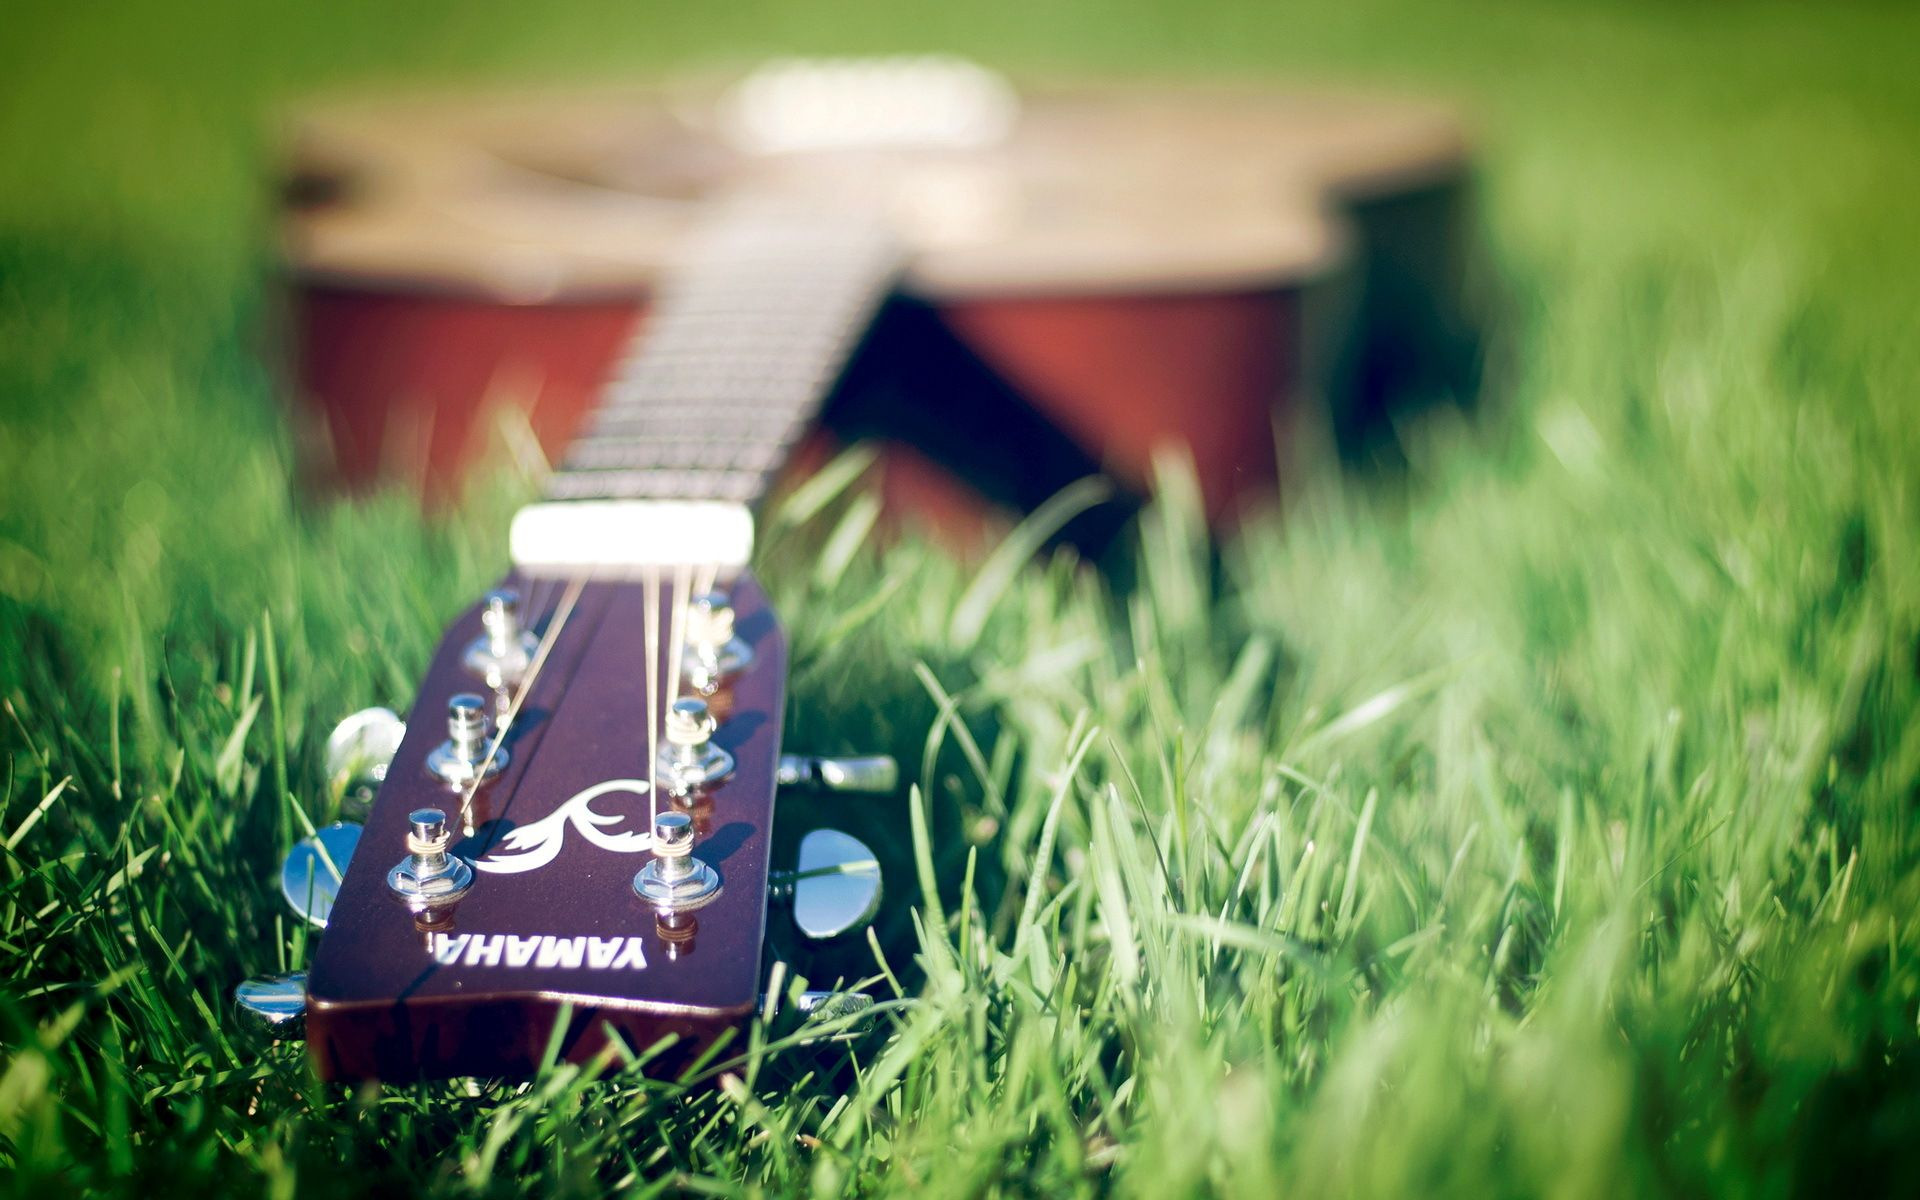 Yamaha acoustic guitar wallpaper